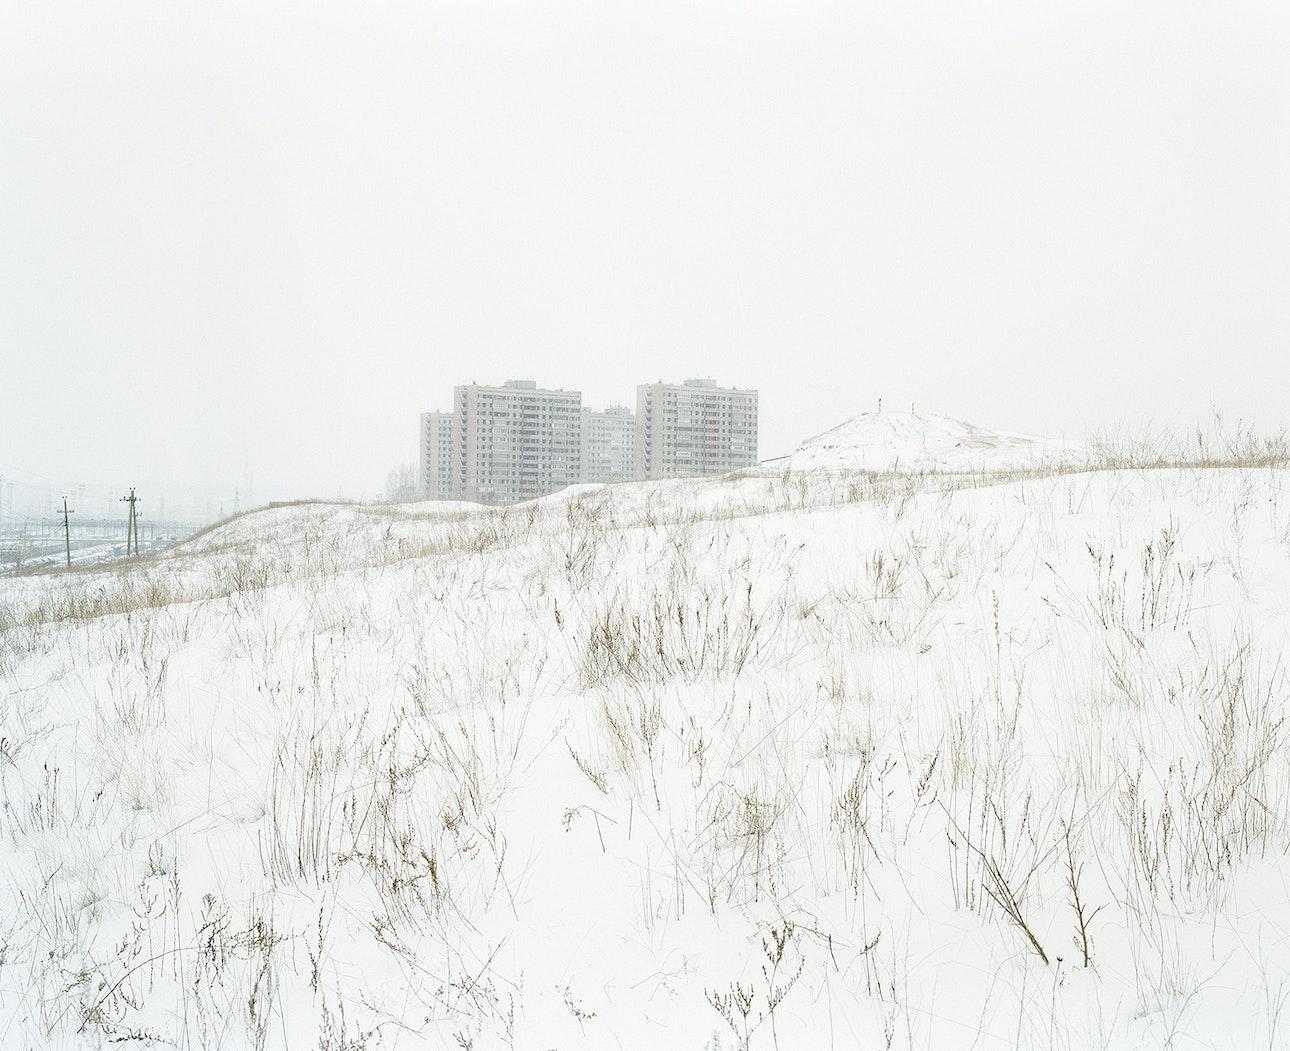 petrov_07